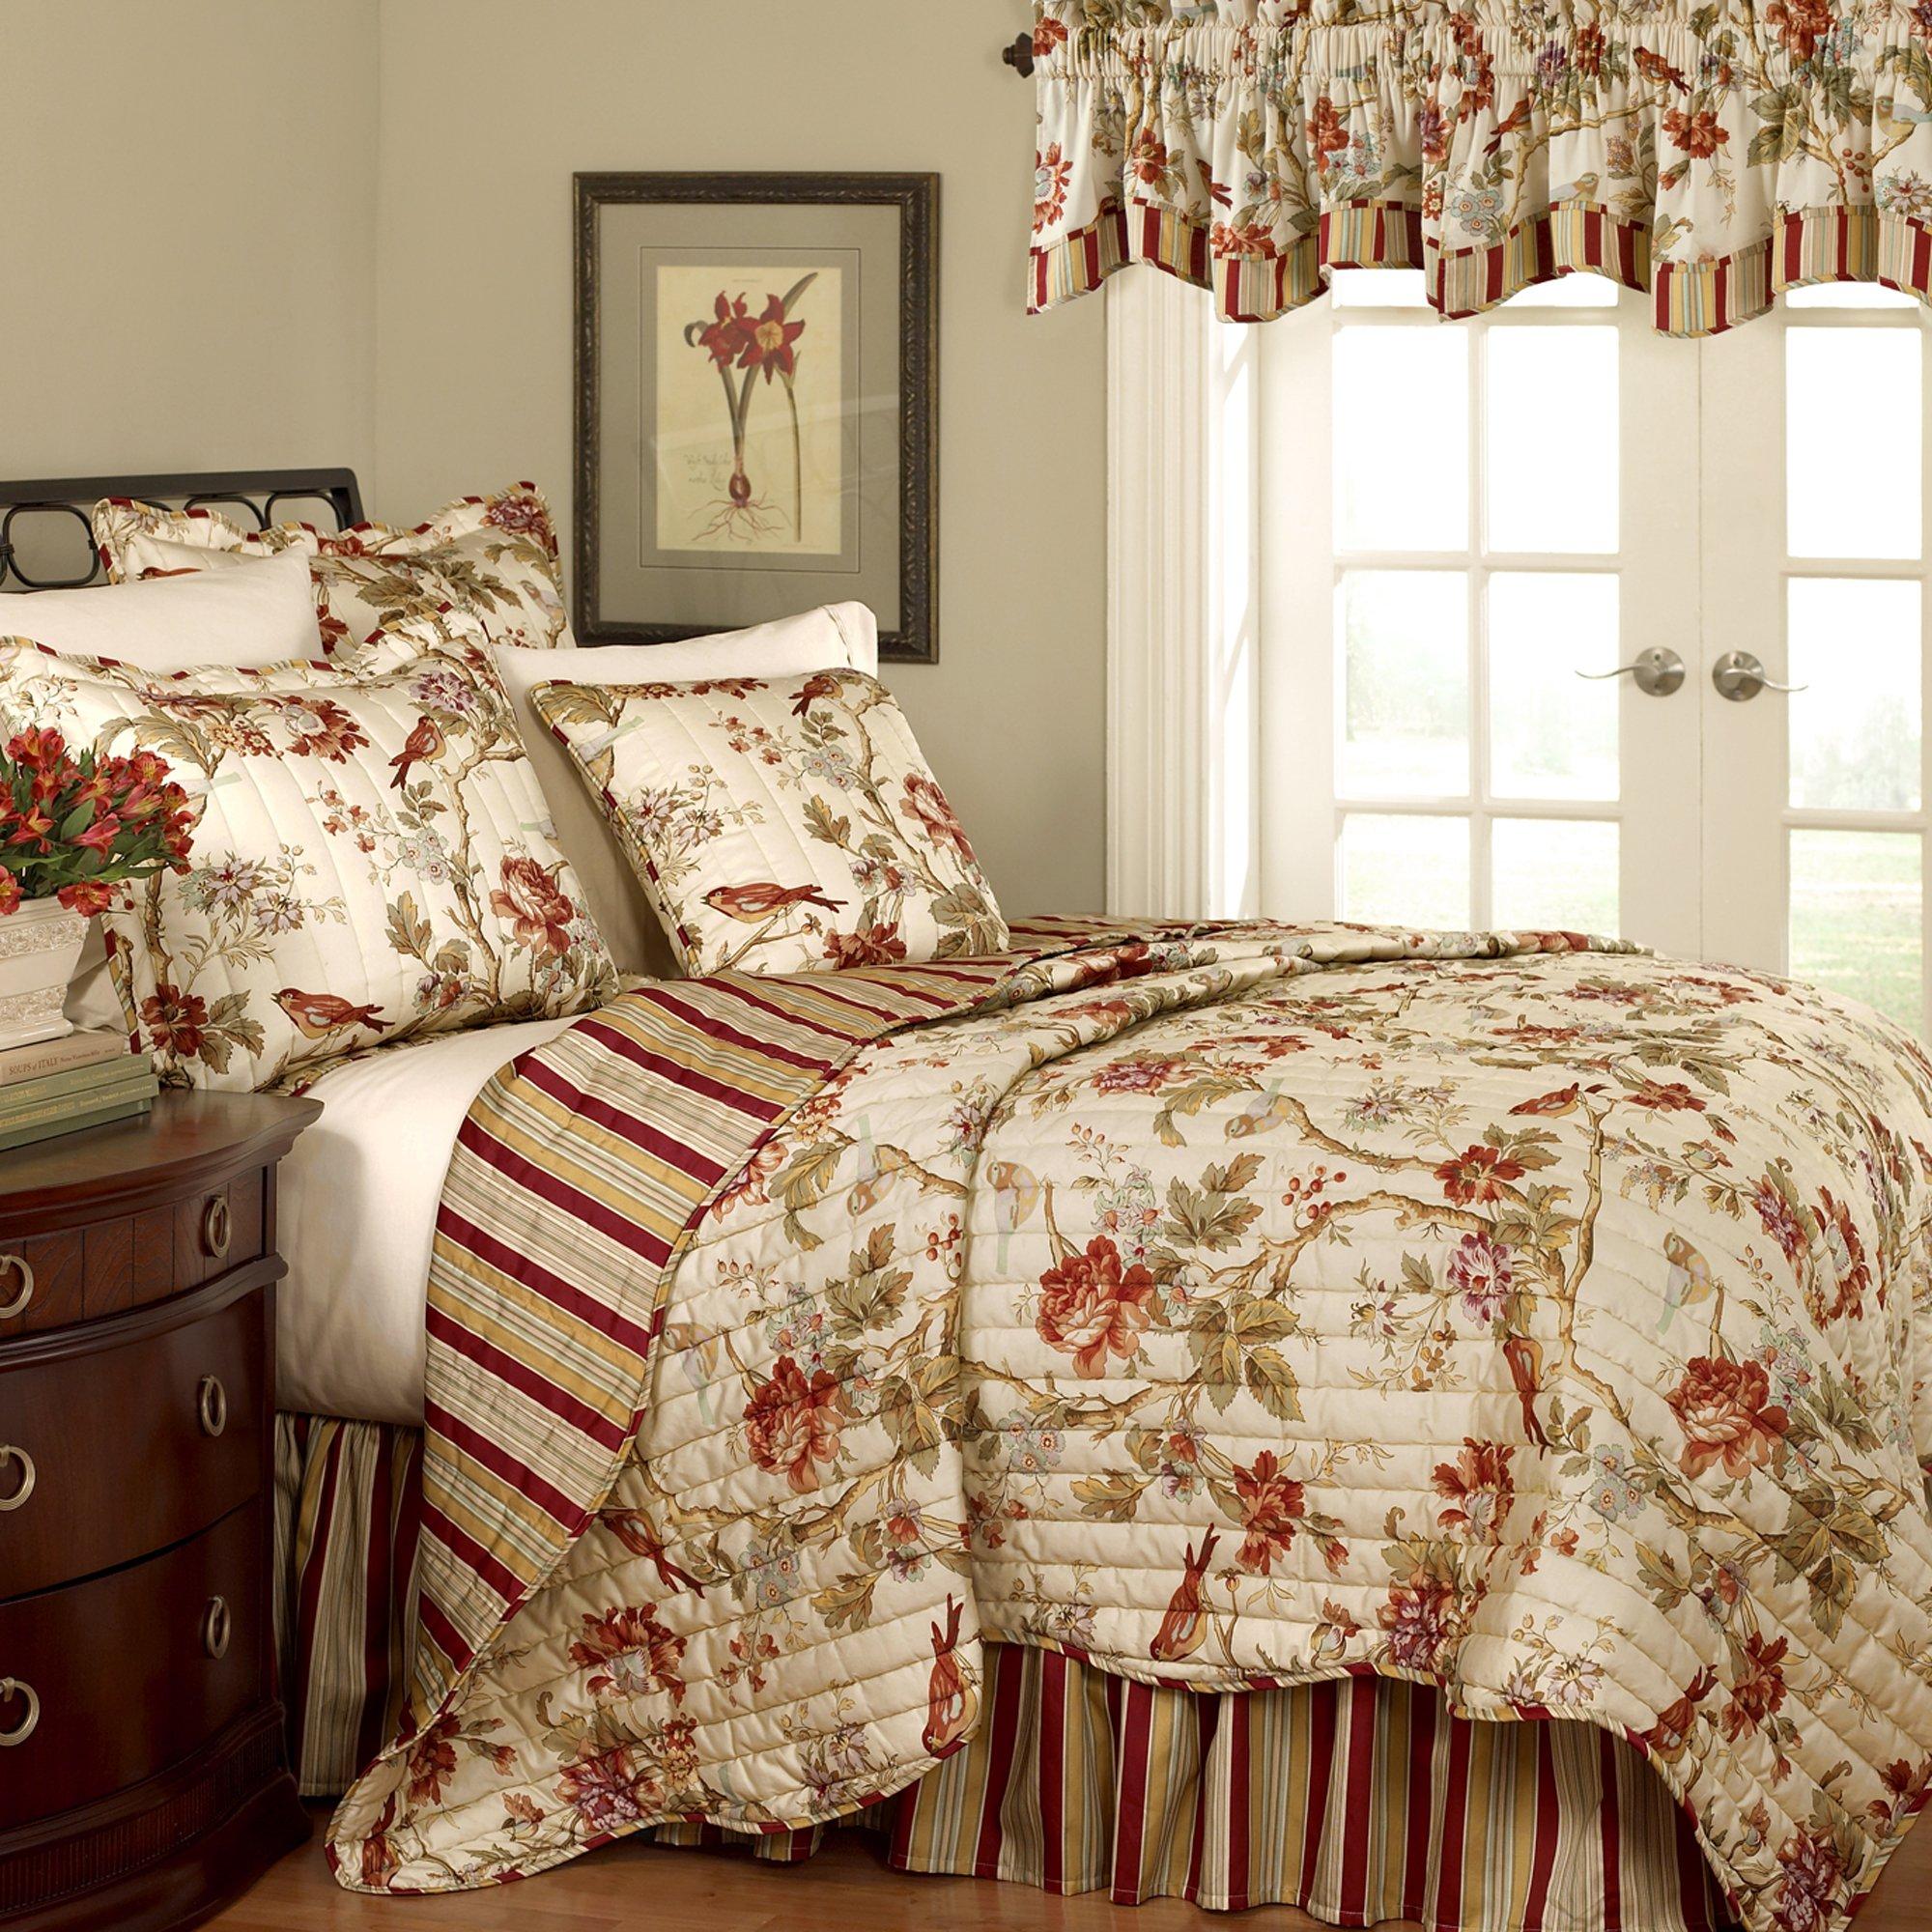 Waverly 11396KINGPPY Charleston Chirp 90-Inch by 104-Inch 4-Piece King Quilt Set, Papaya